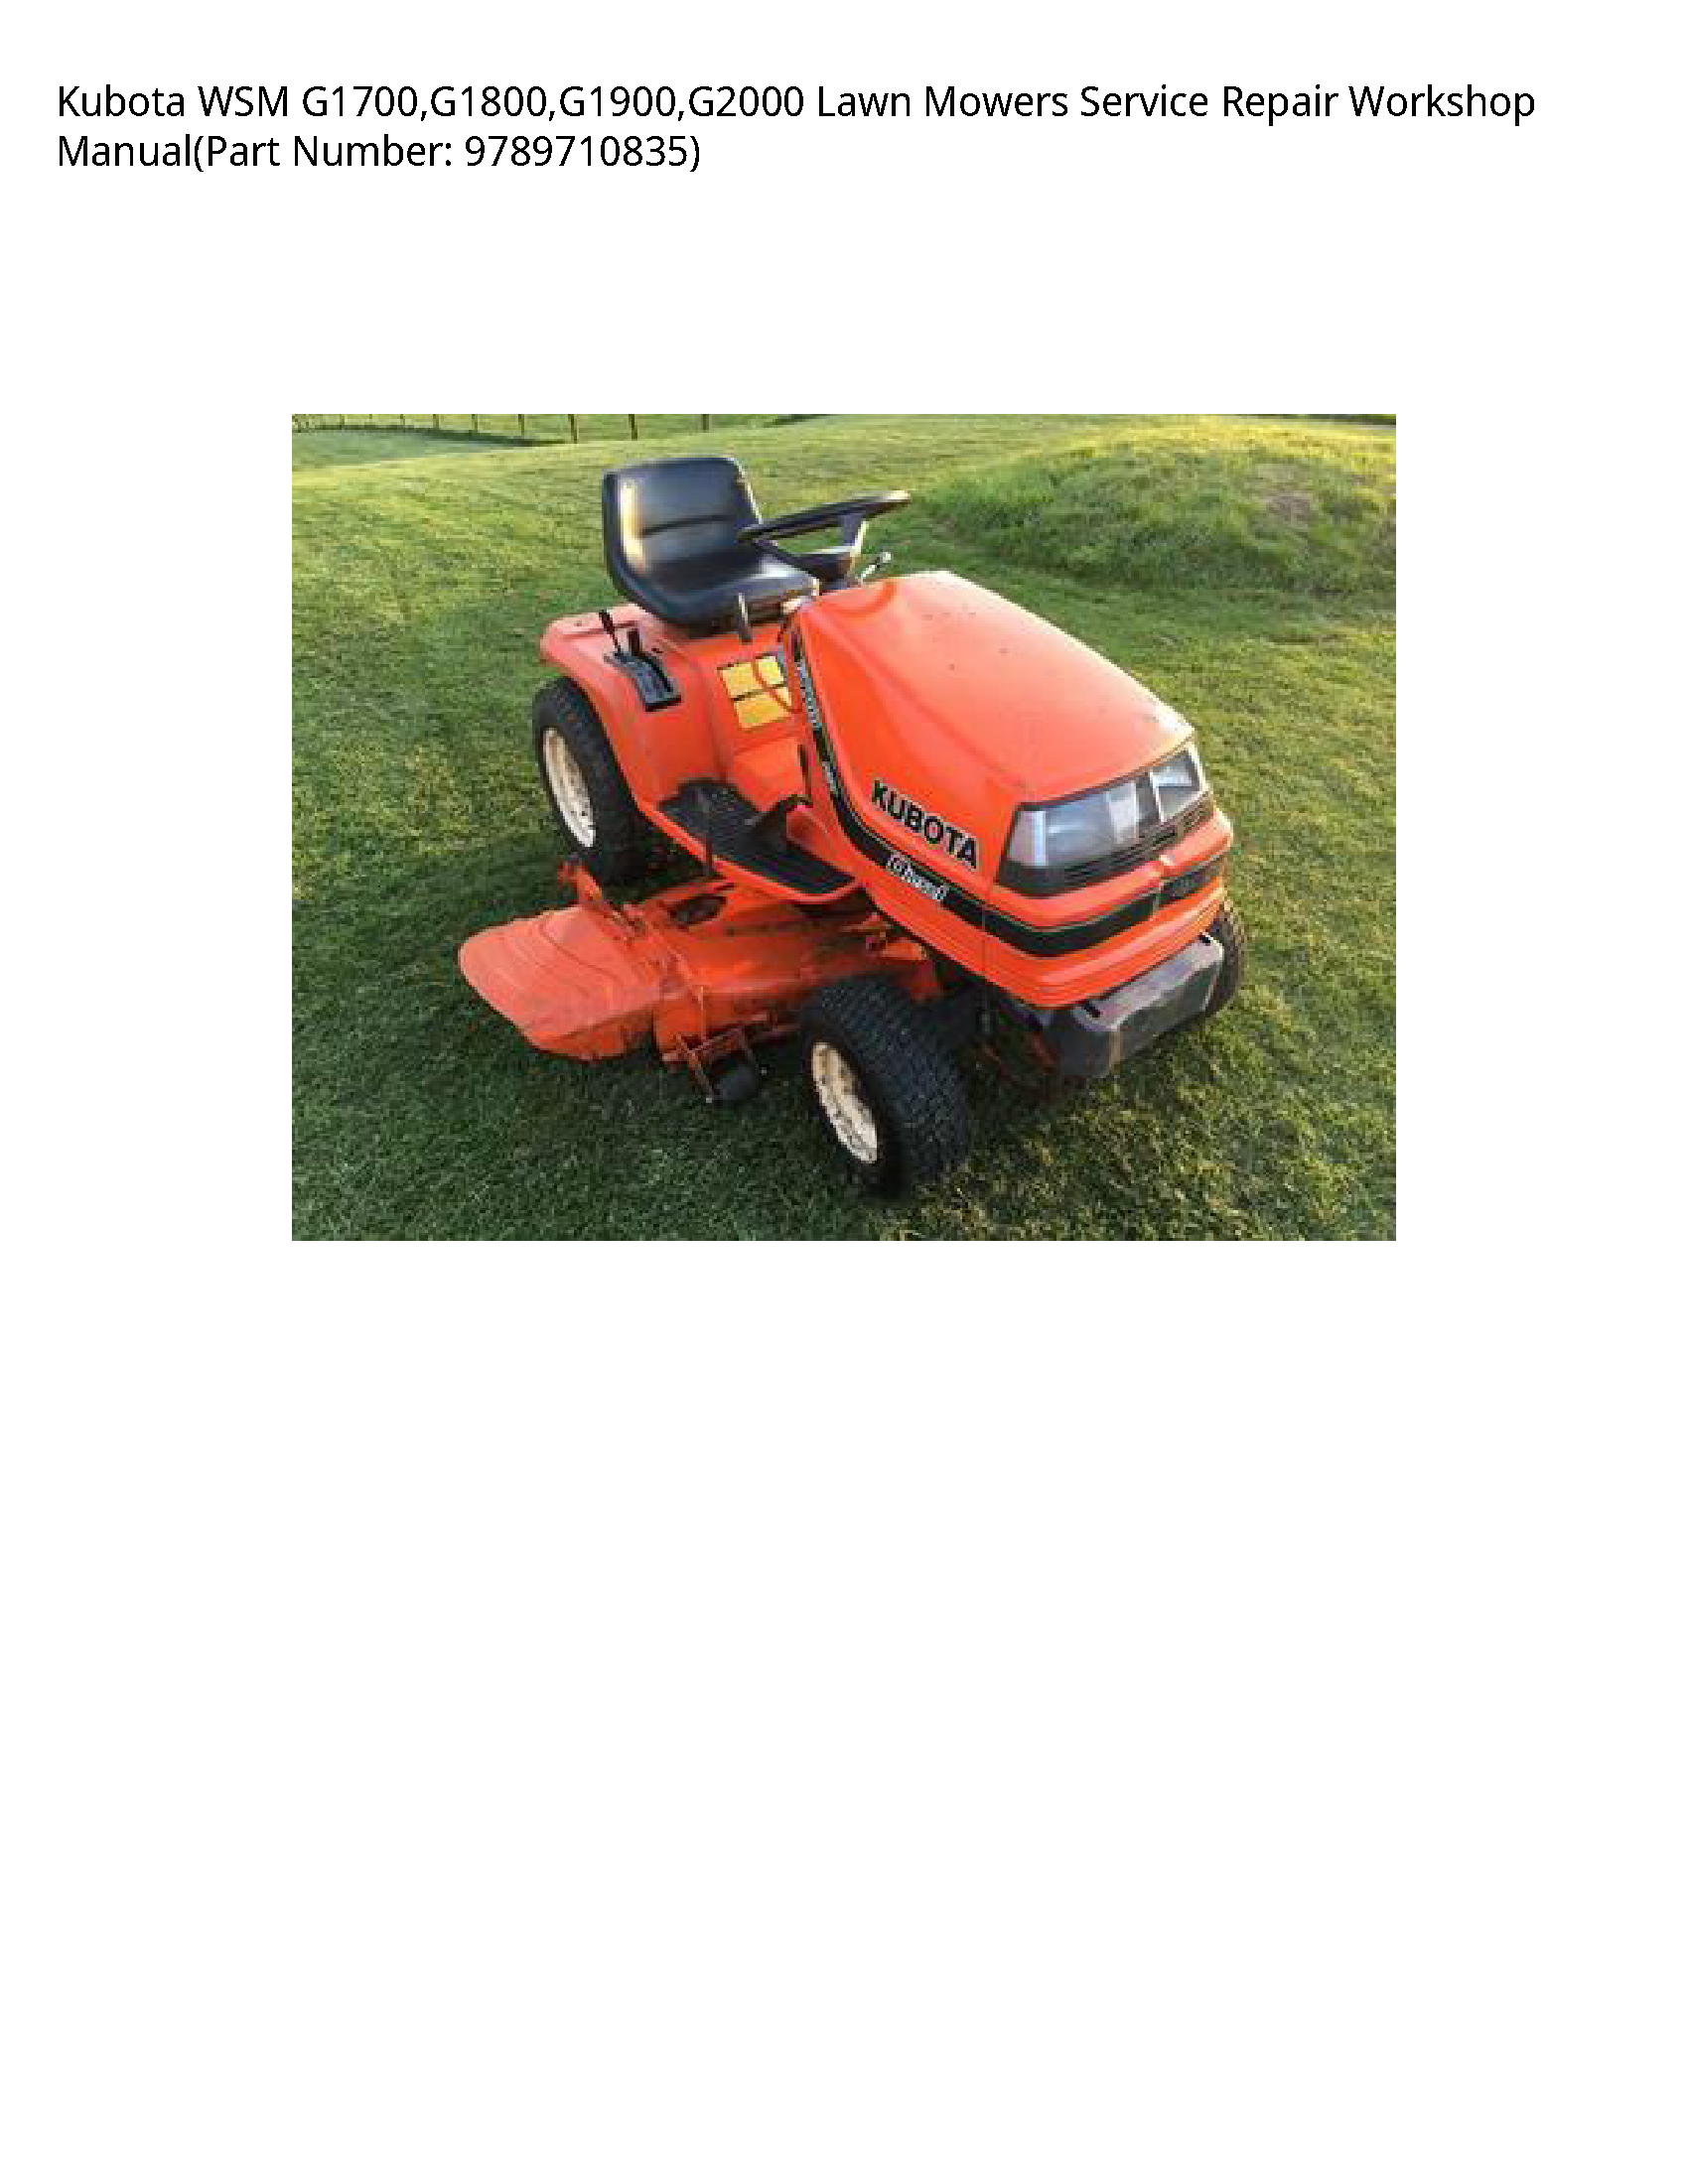 Kubota G1700 Wsm Lawn Mowers Manual Lawn Mower Service Kubota Lawn Mower Repair